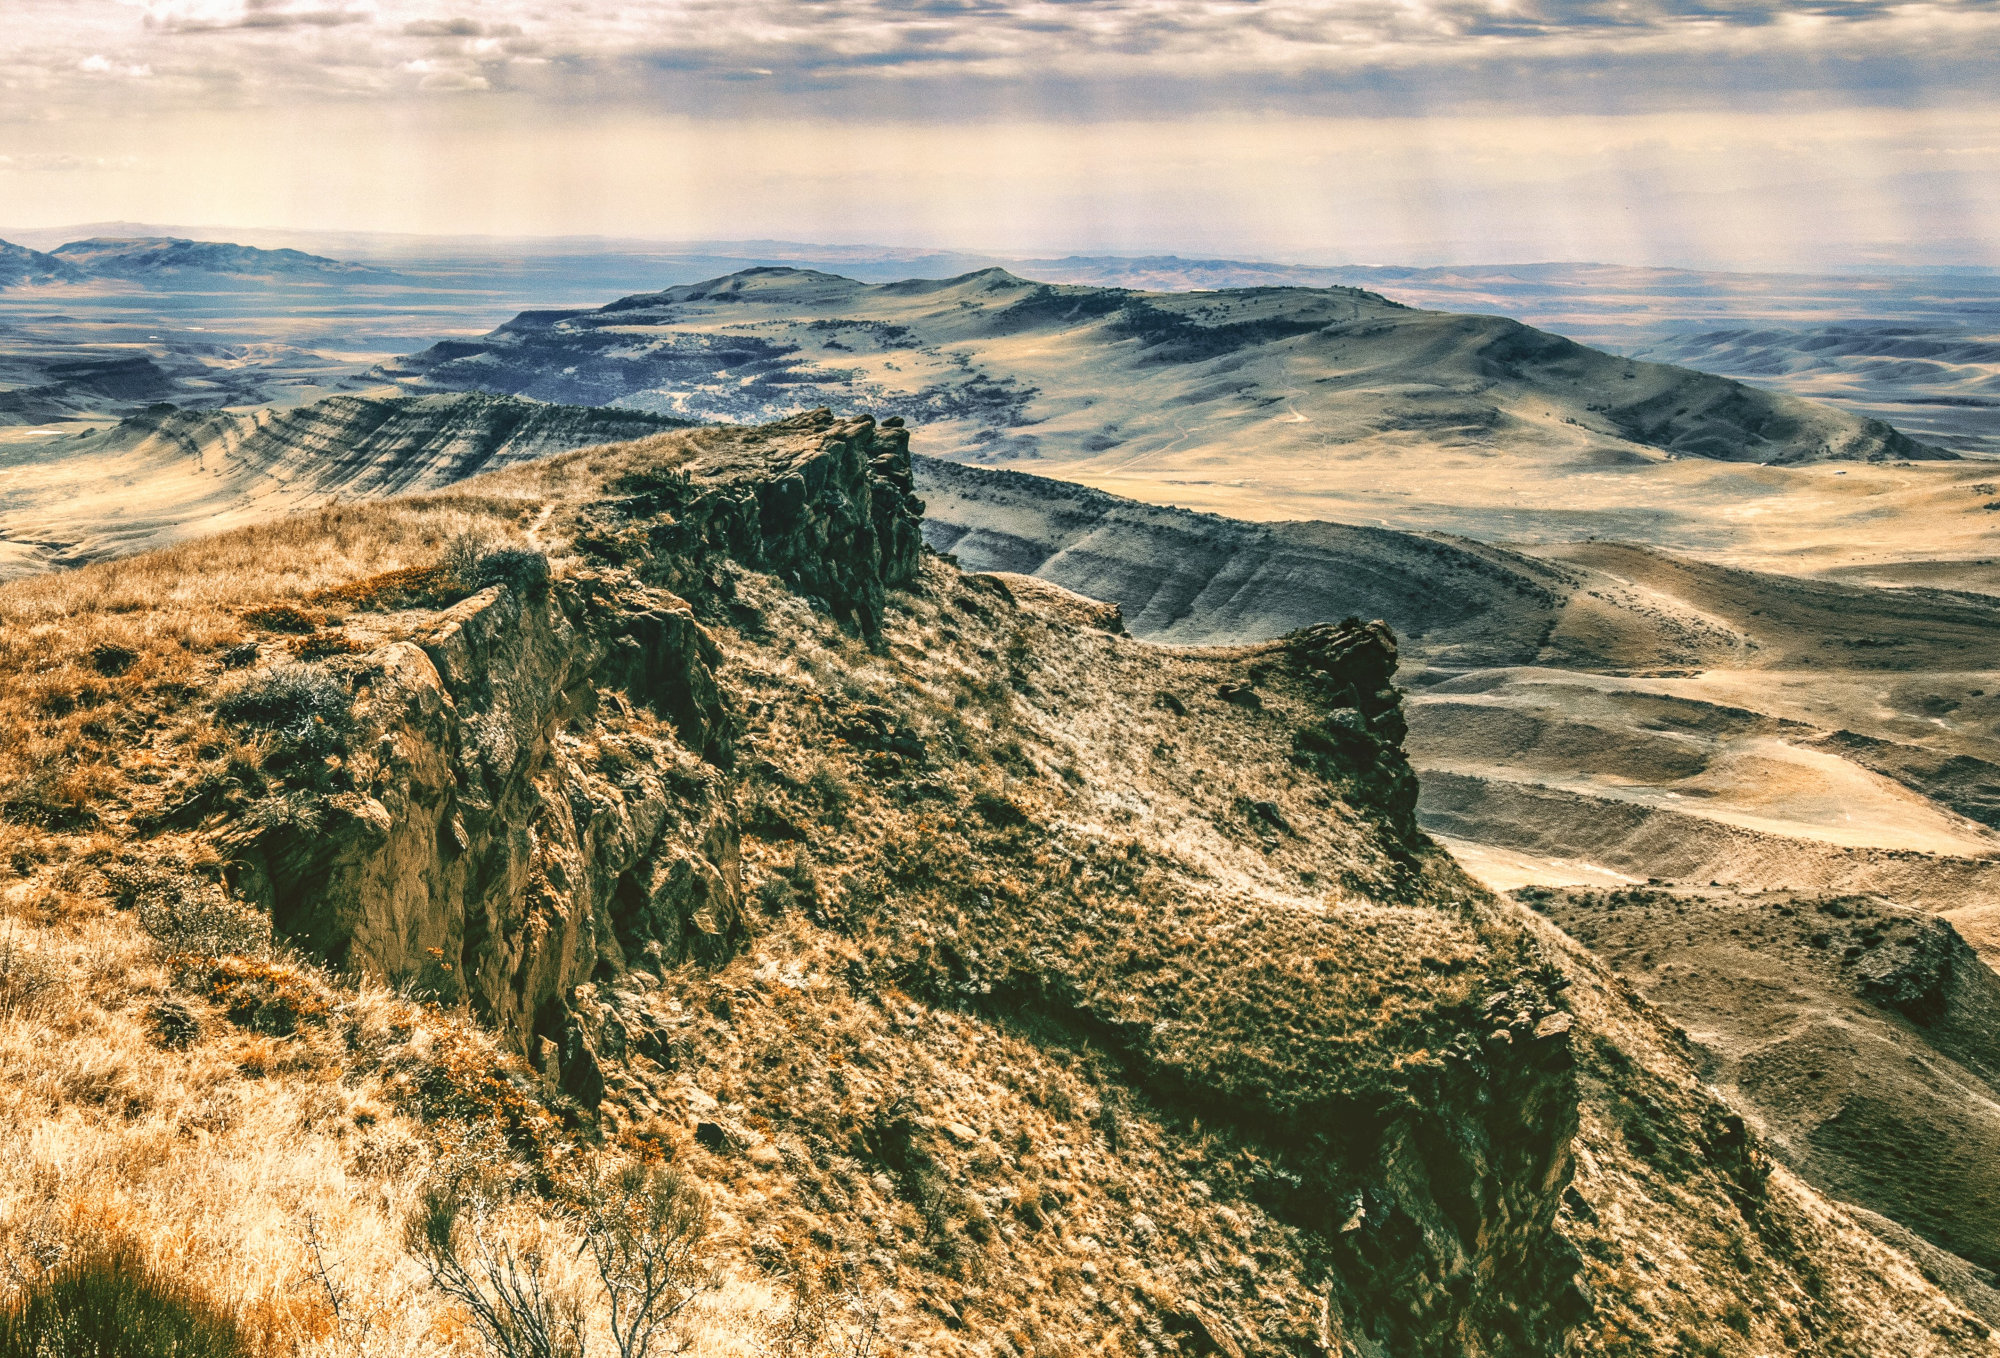 Vast views from the Azerbaijan border